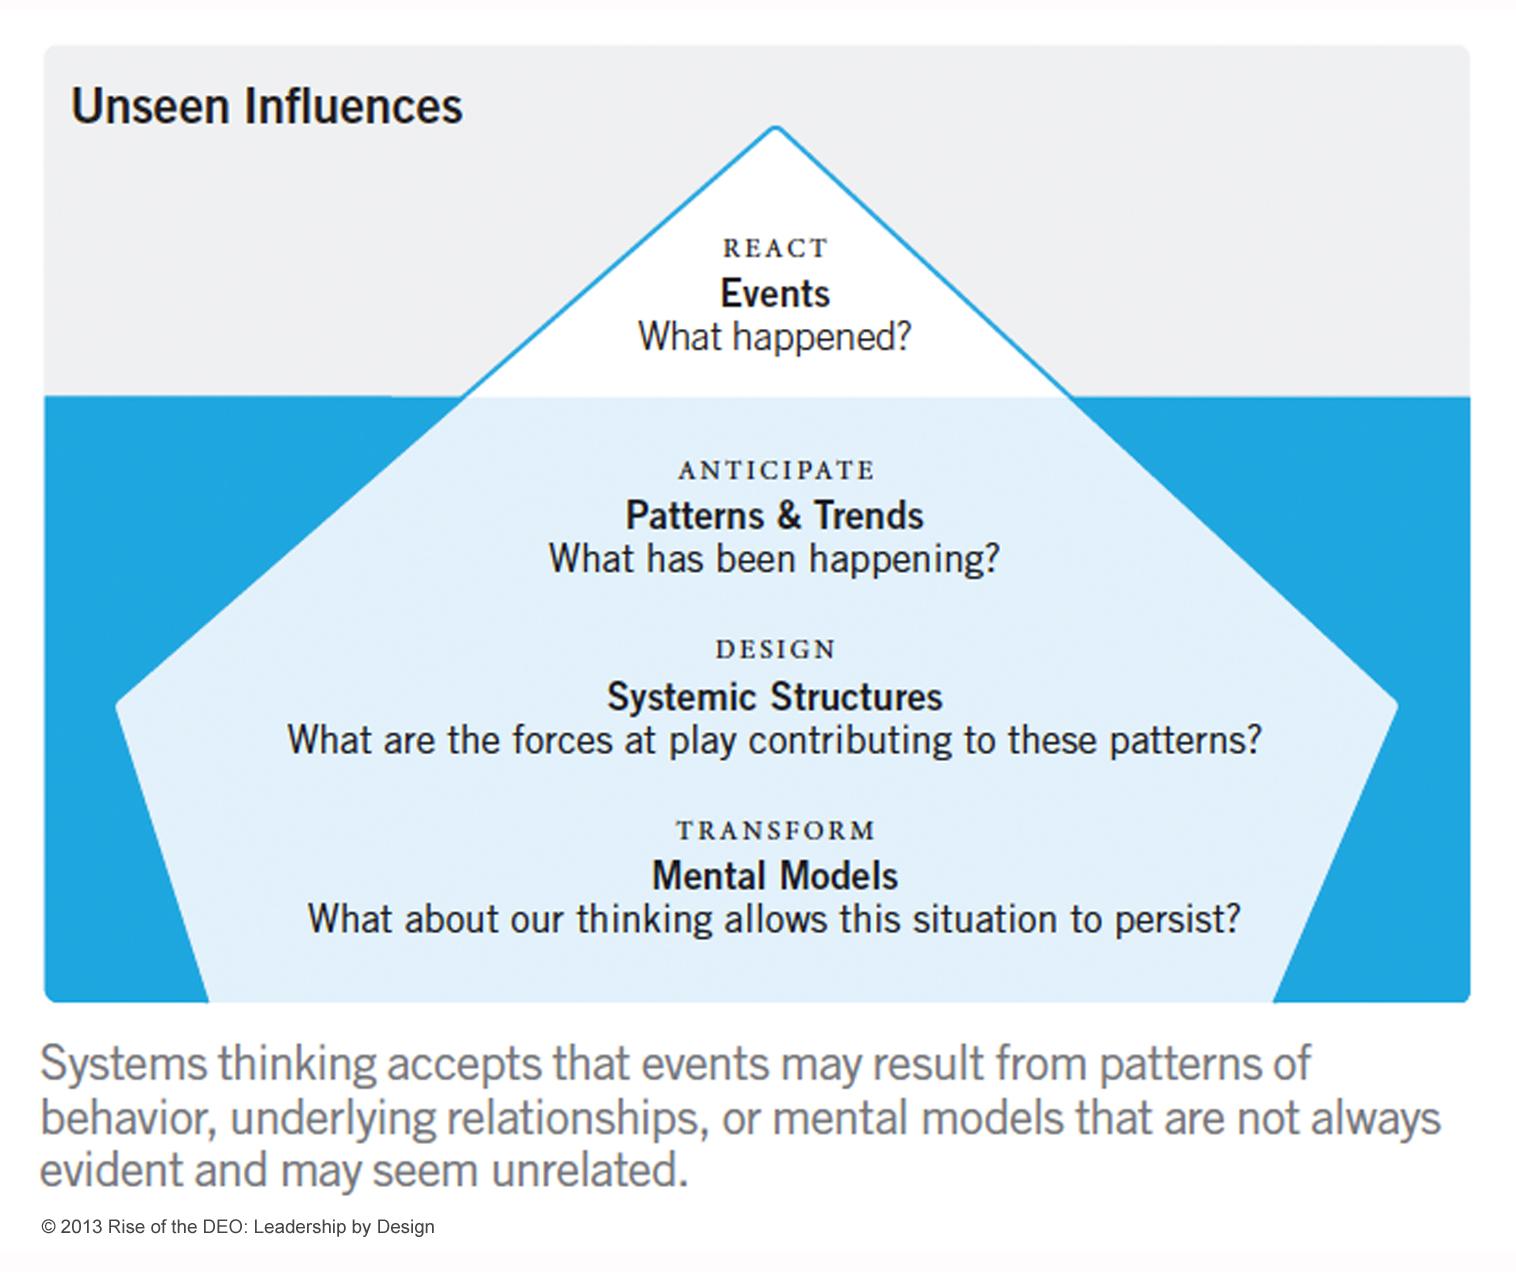 NEW_infographic_unseen_influences.jpg